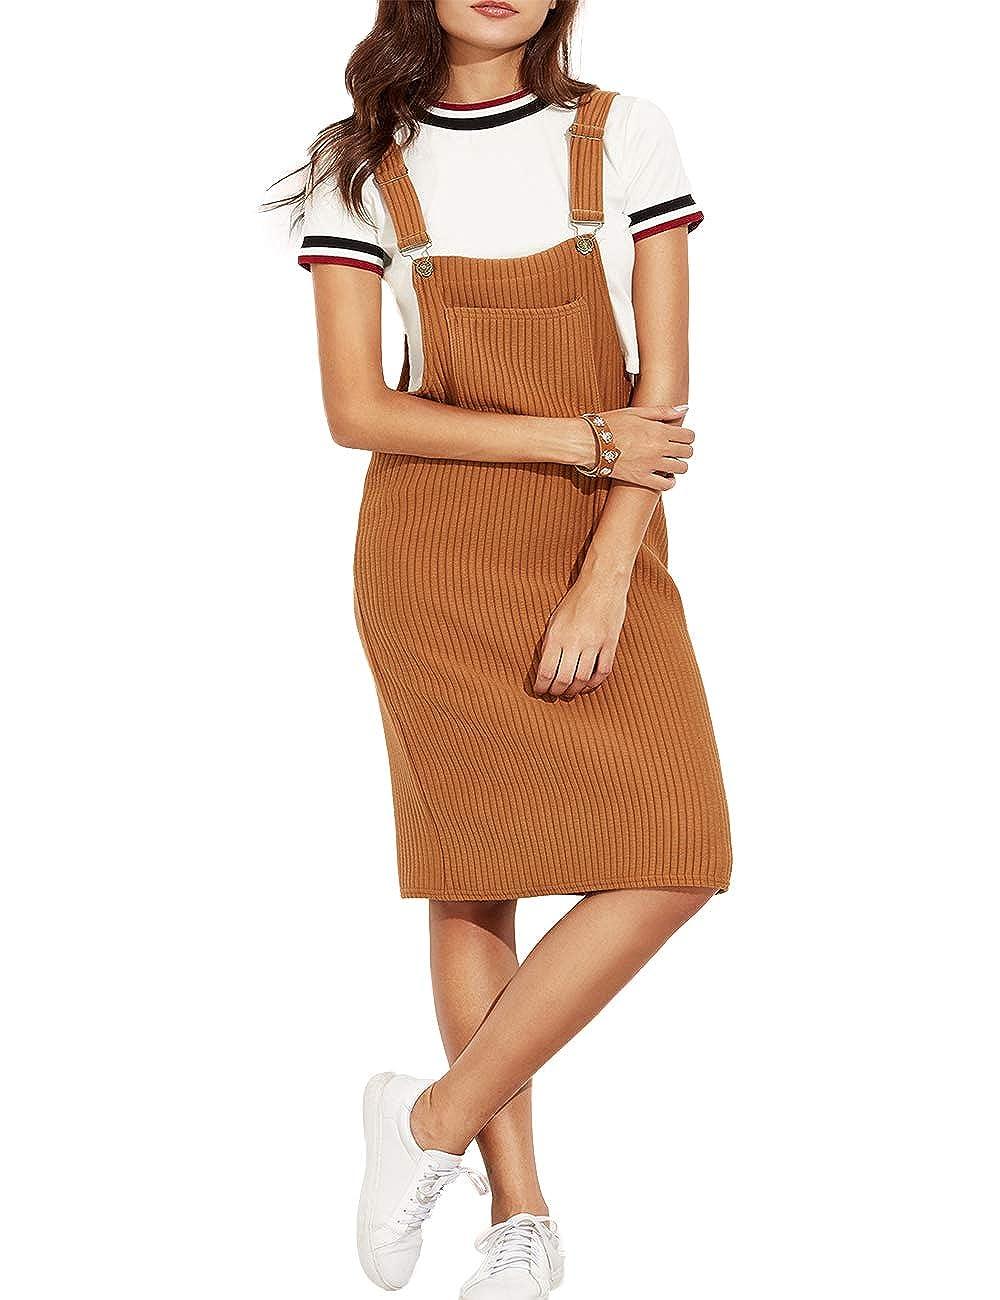 Innifer Women's Elastic Cotton Suspender Skirt Pinafore Bib Overall Dress